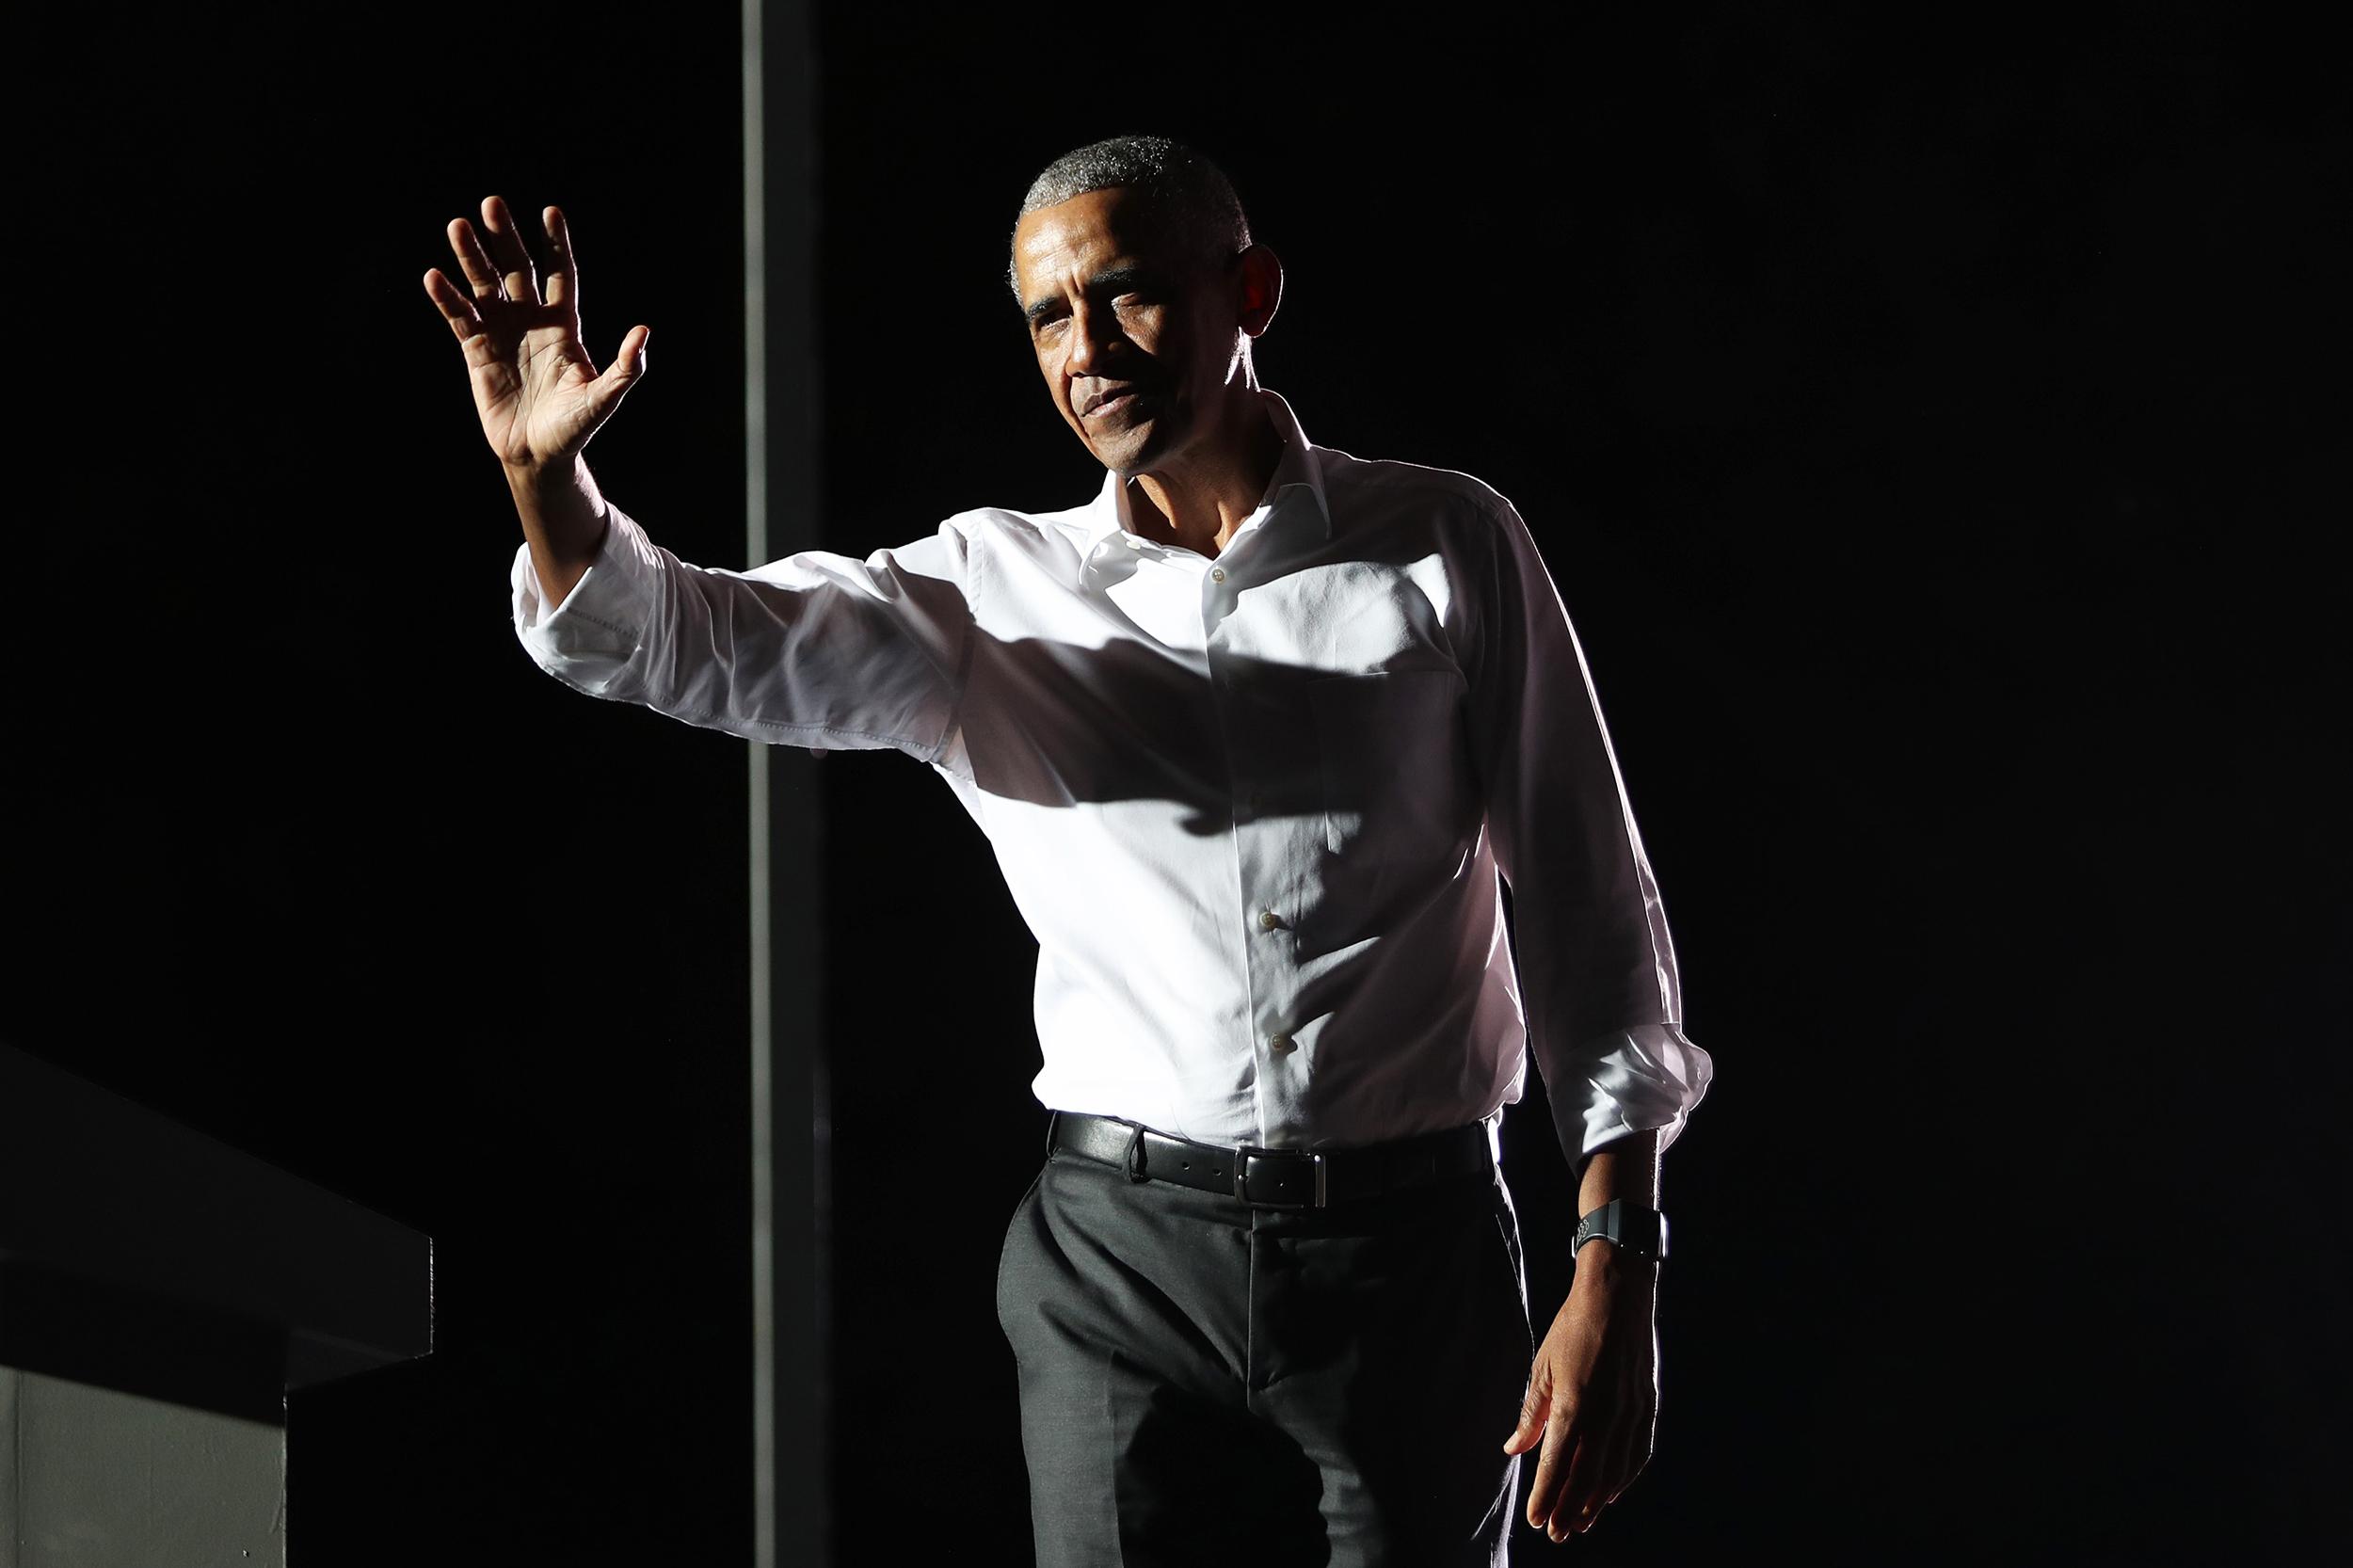 Obama scraps plans for 60th birthday bash amid Covid surge